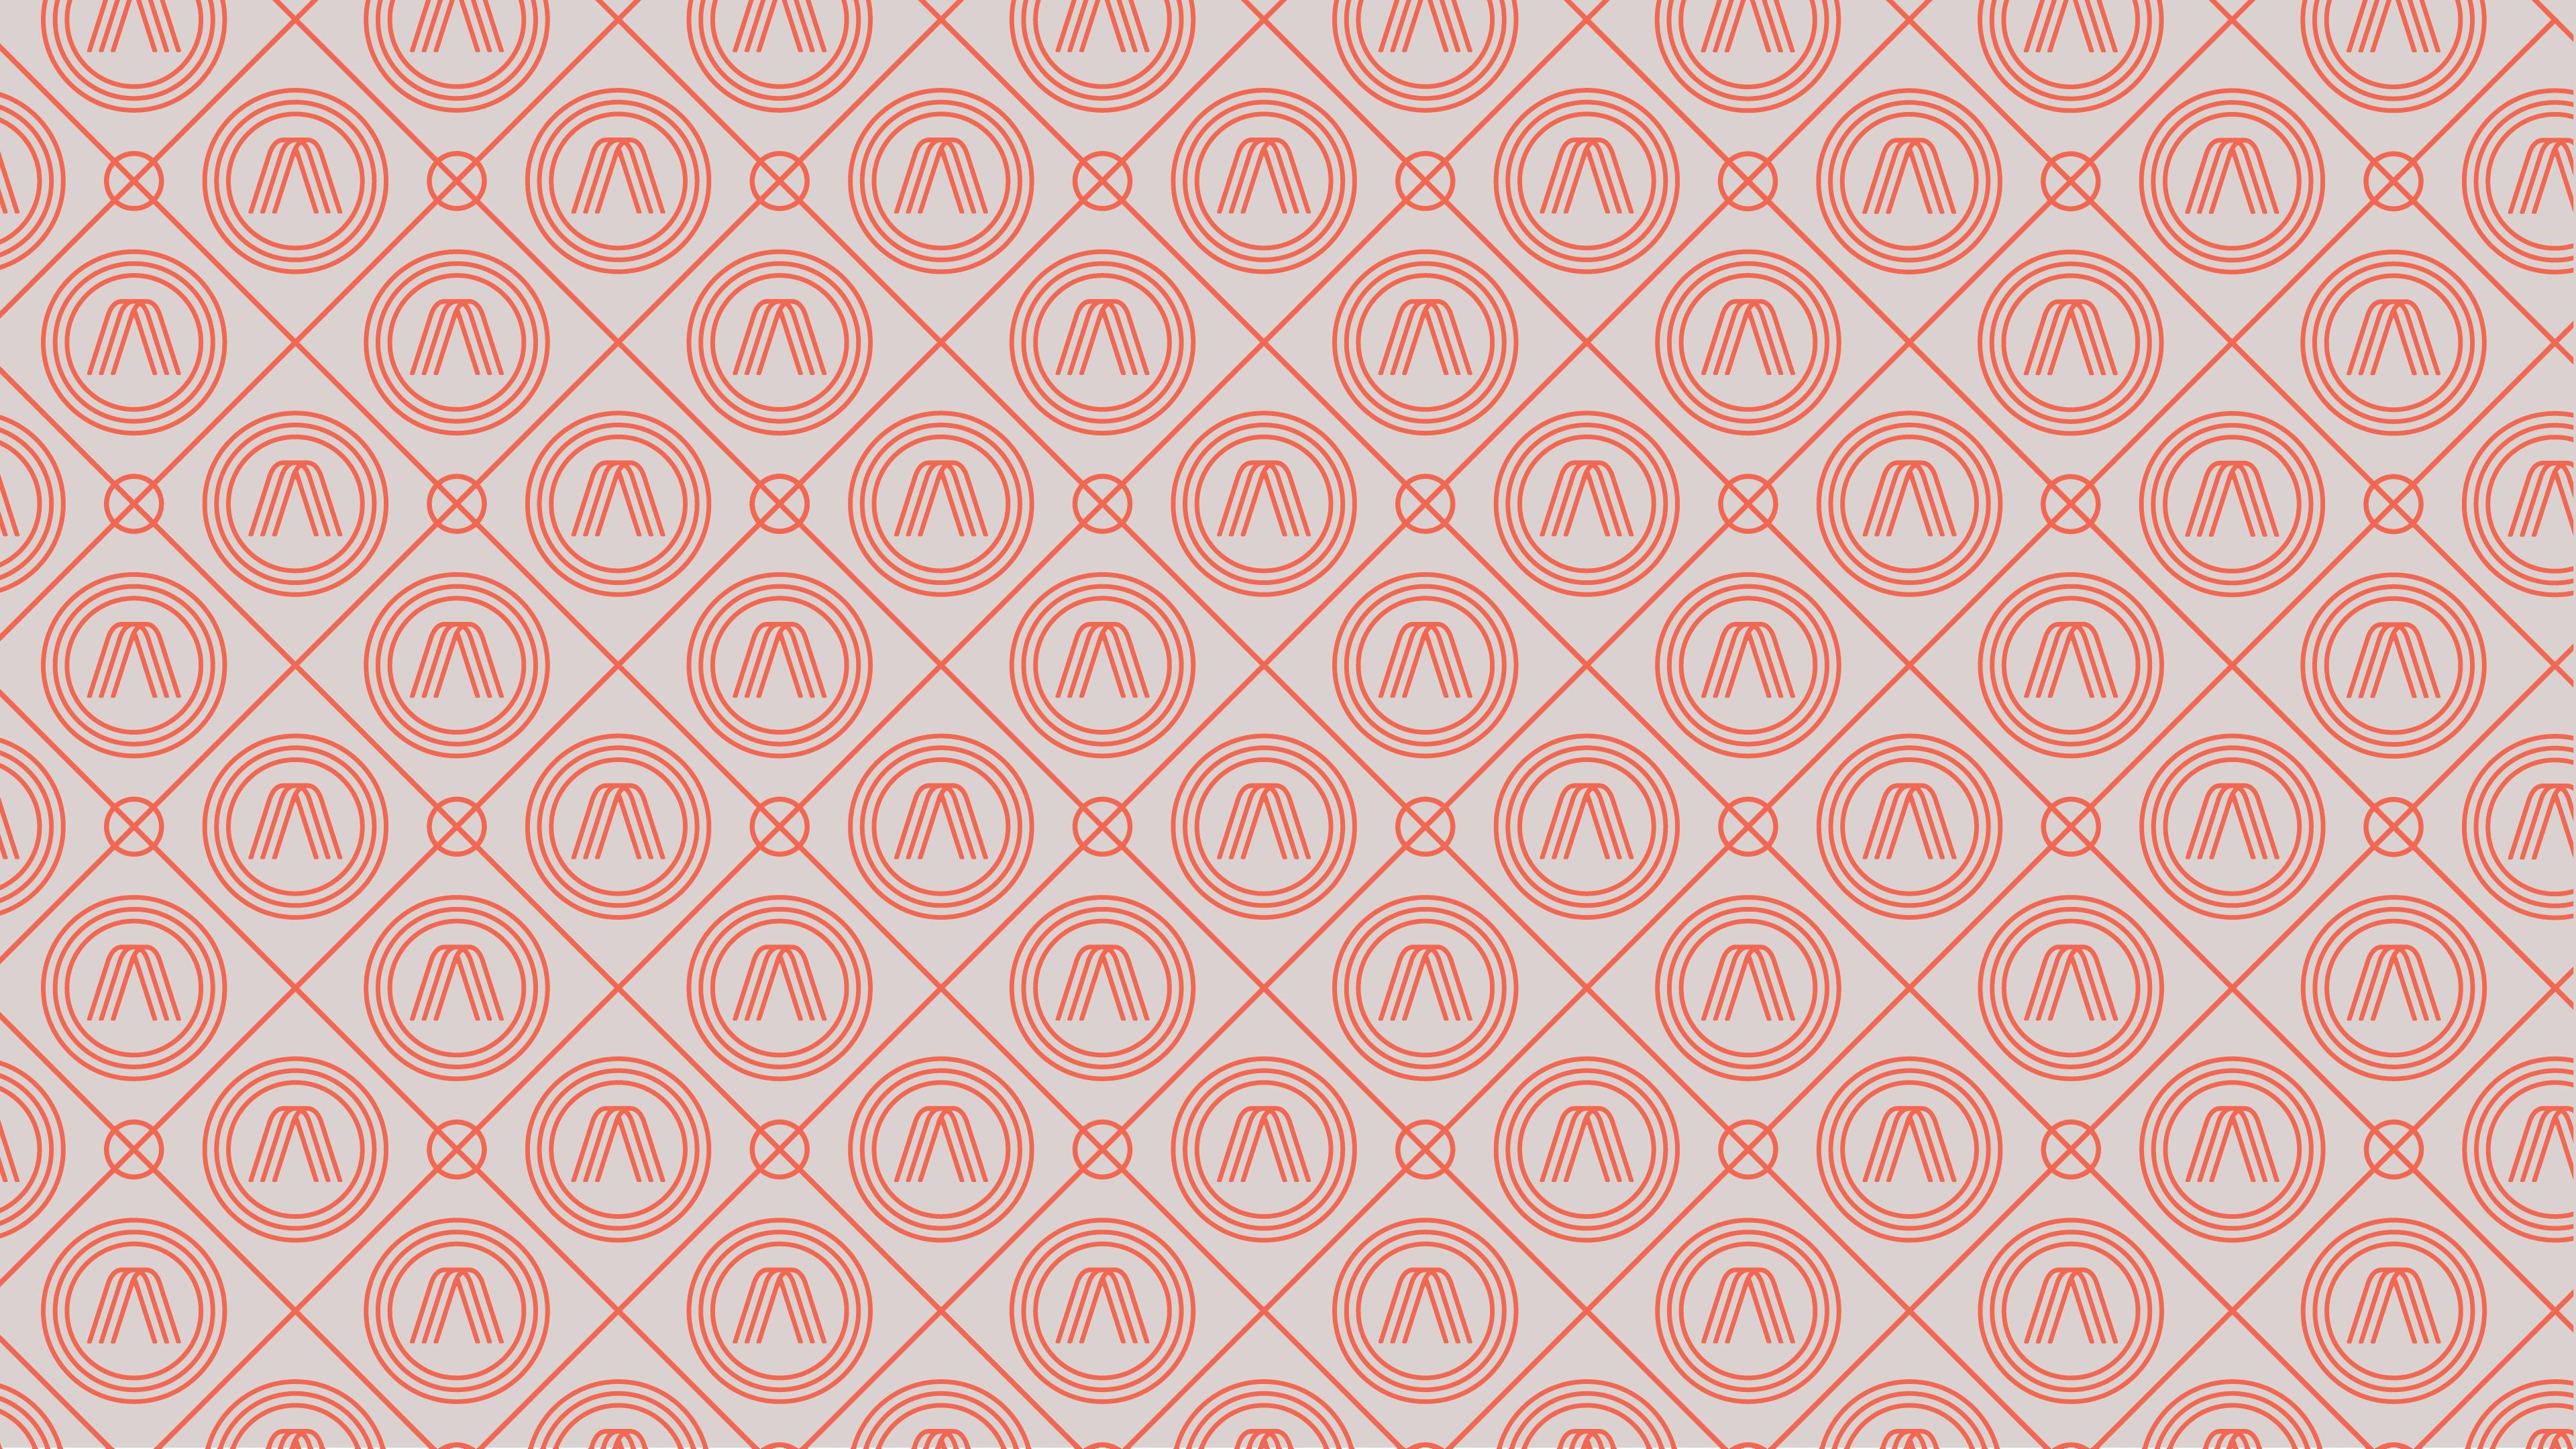 Ave-Pattern-Logos@2x